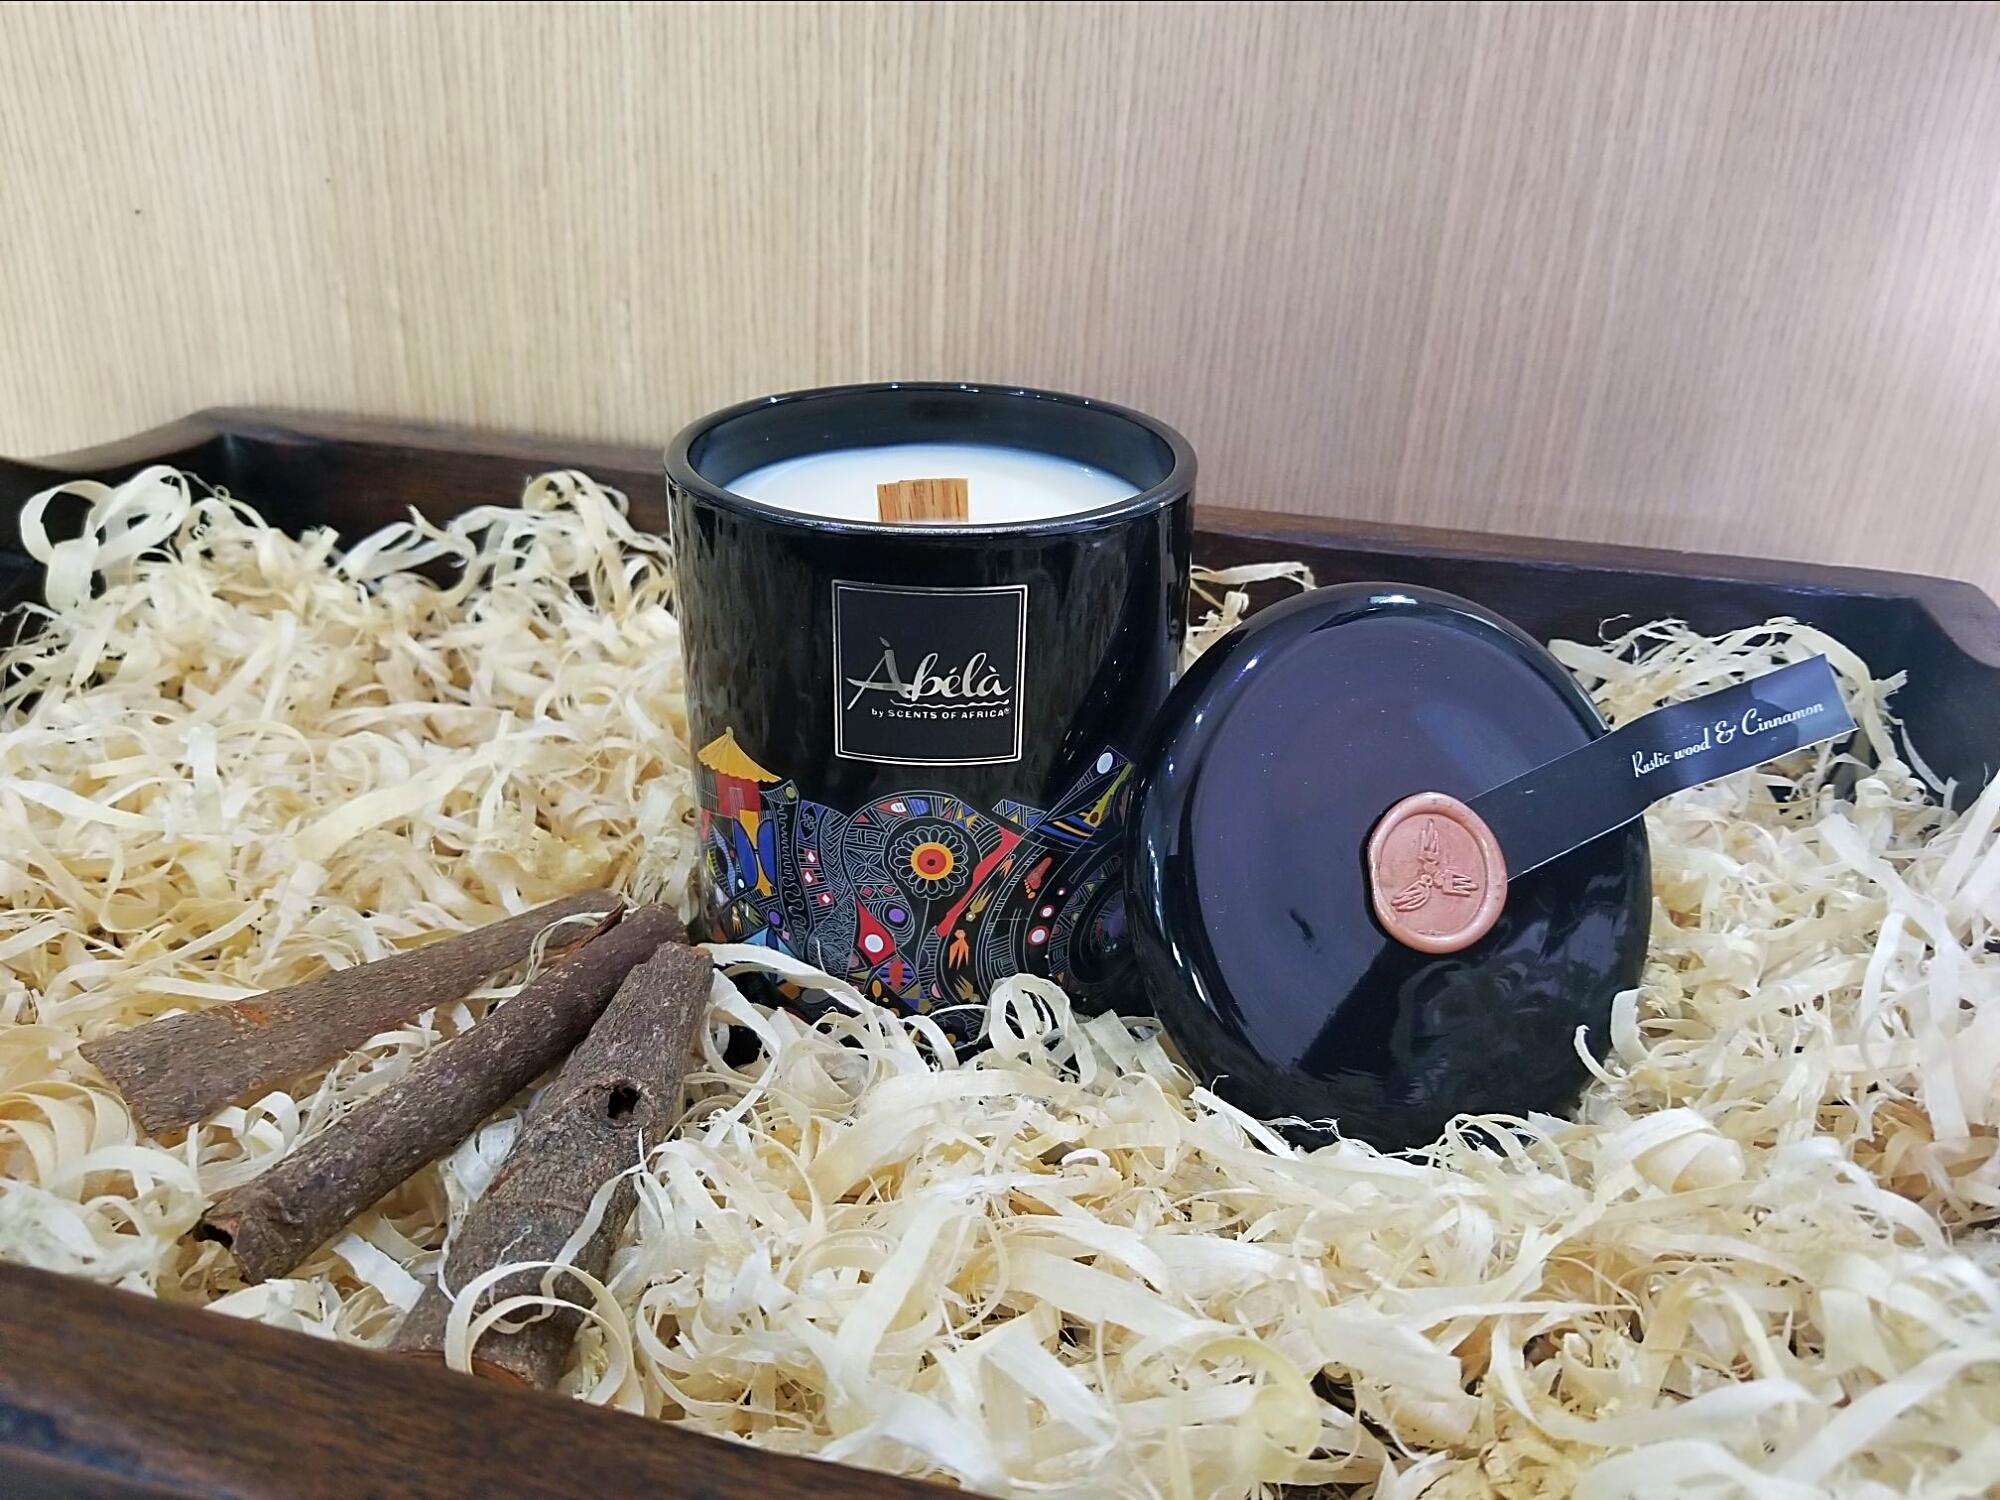 Rustic Wood & Cinnamon Perfume Candle 420g